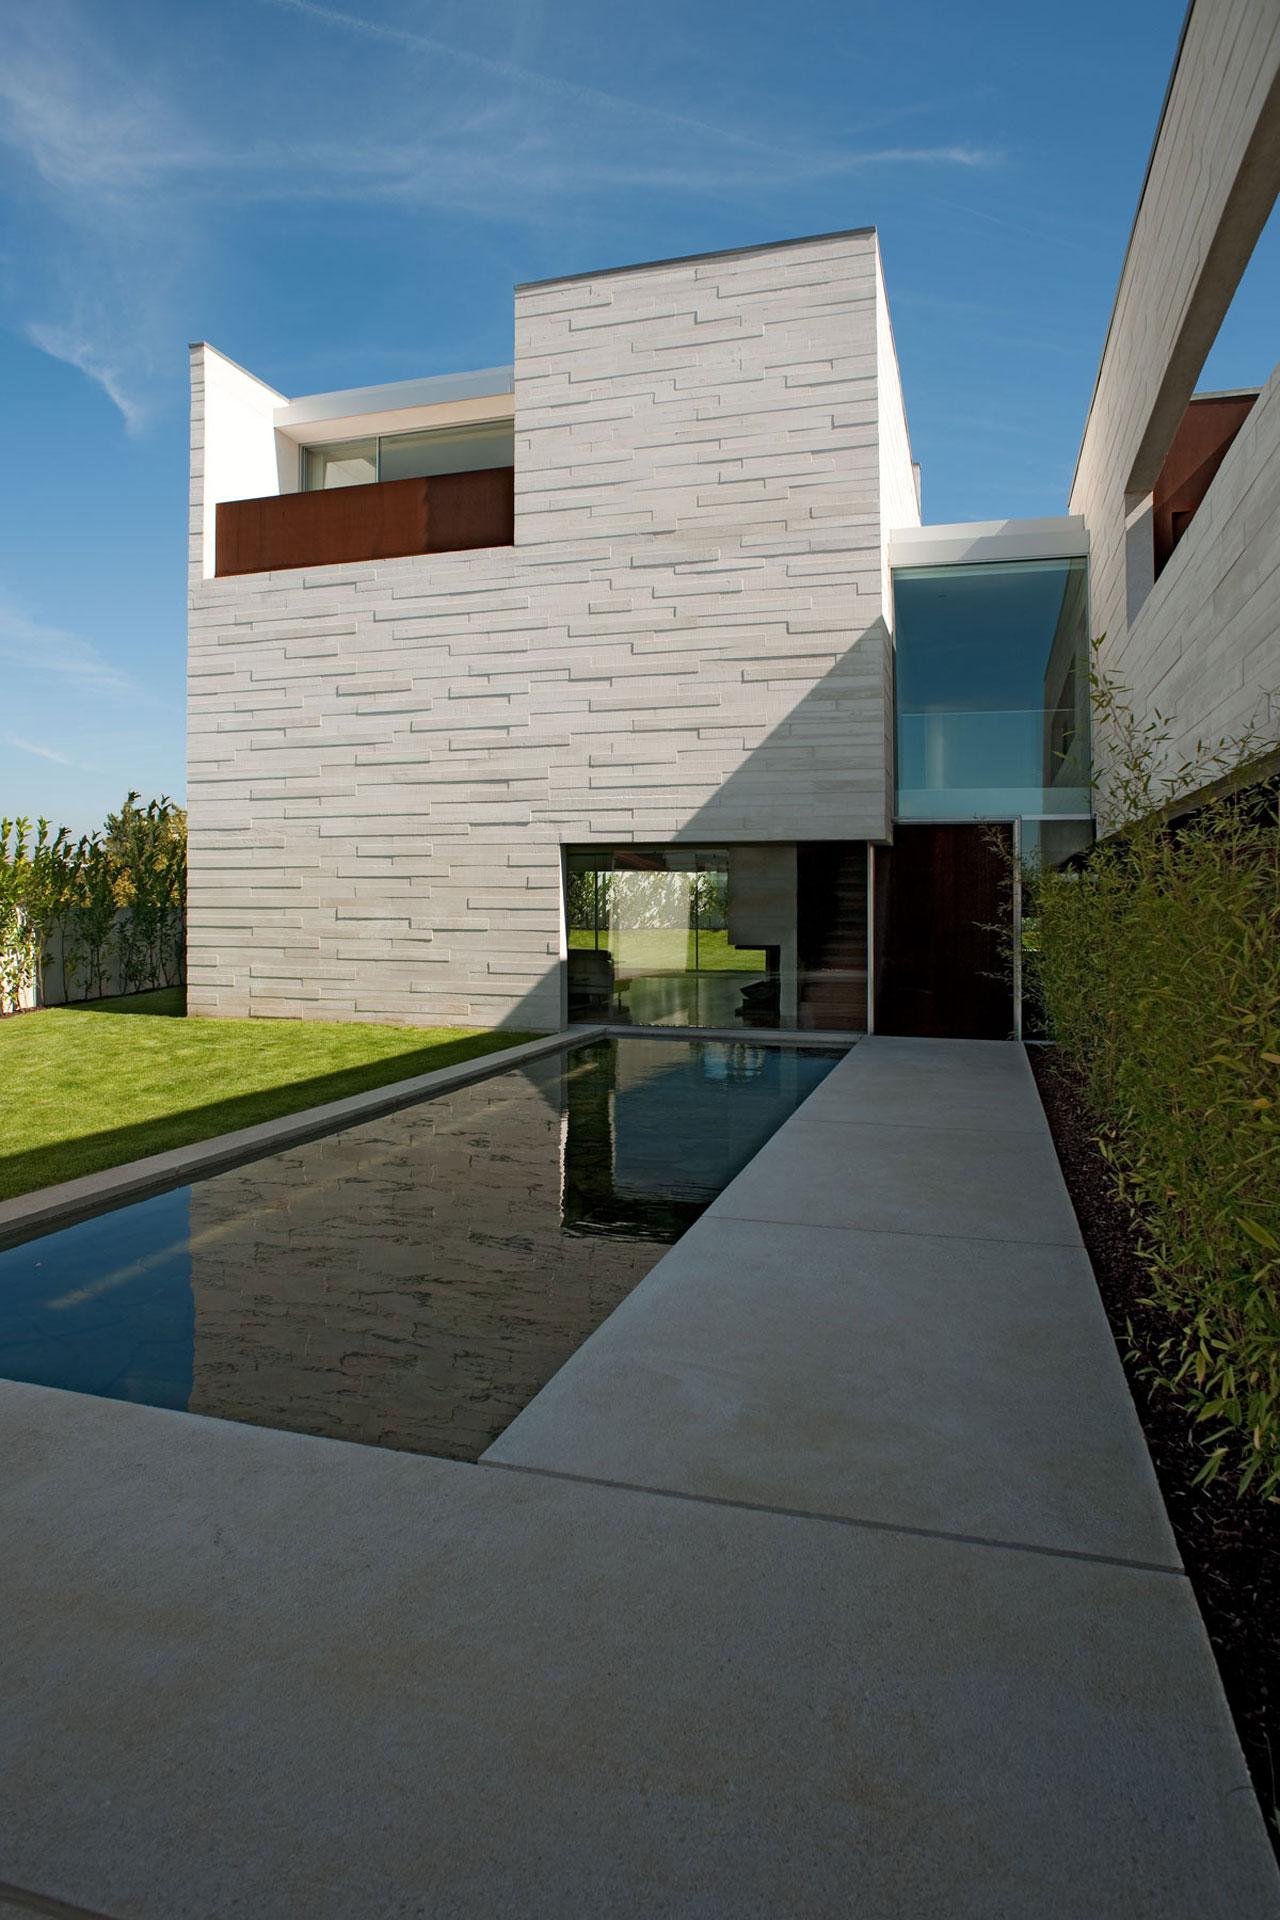 Casa em Aldoar / Topos Atelier De Arquitectura, ©  Xavier Antunes